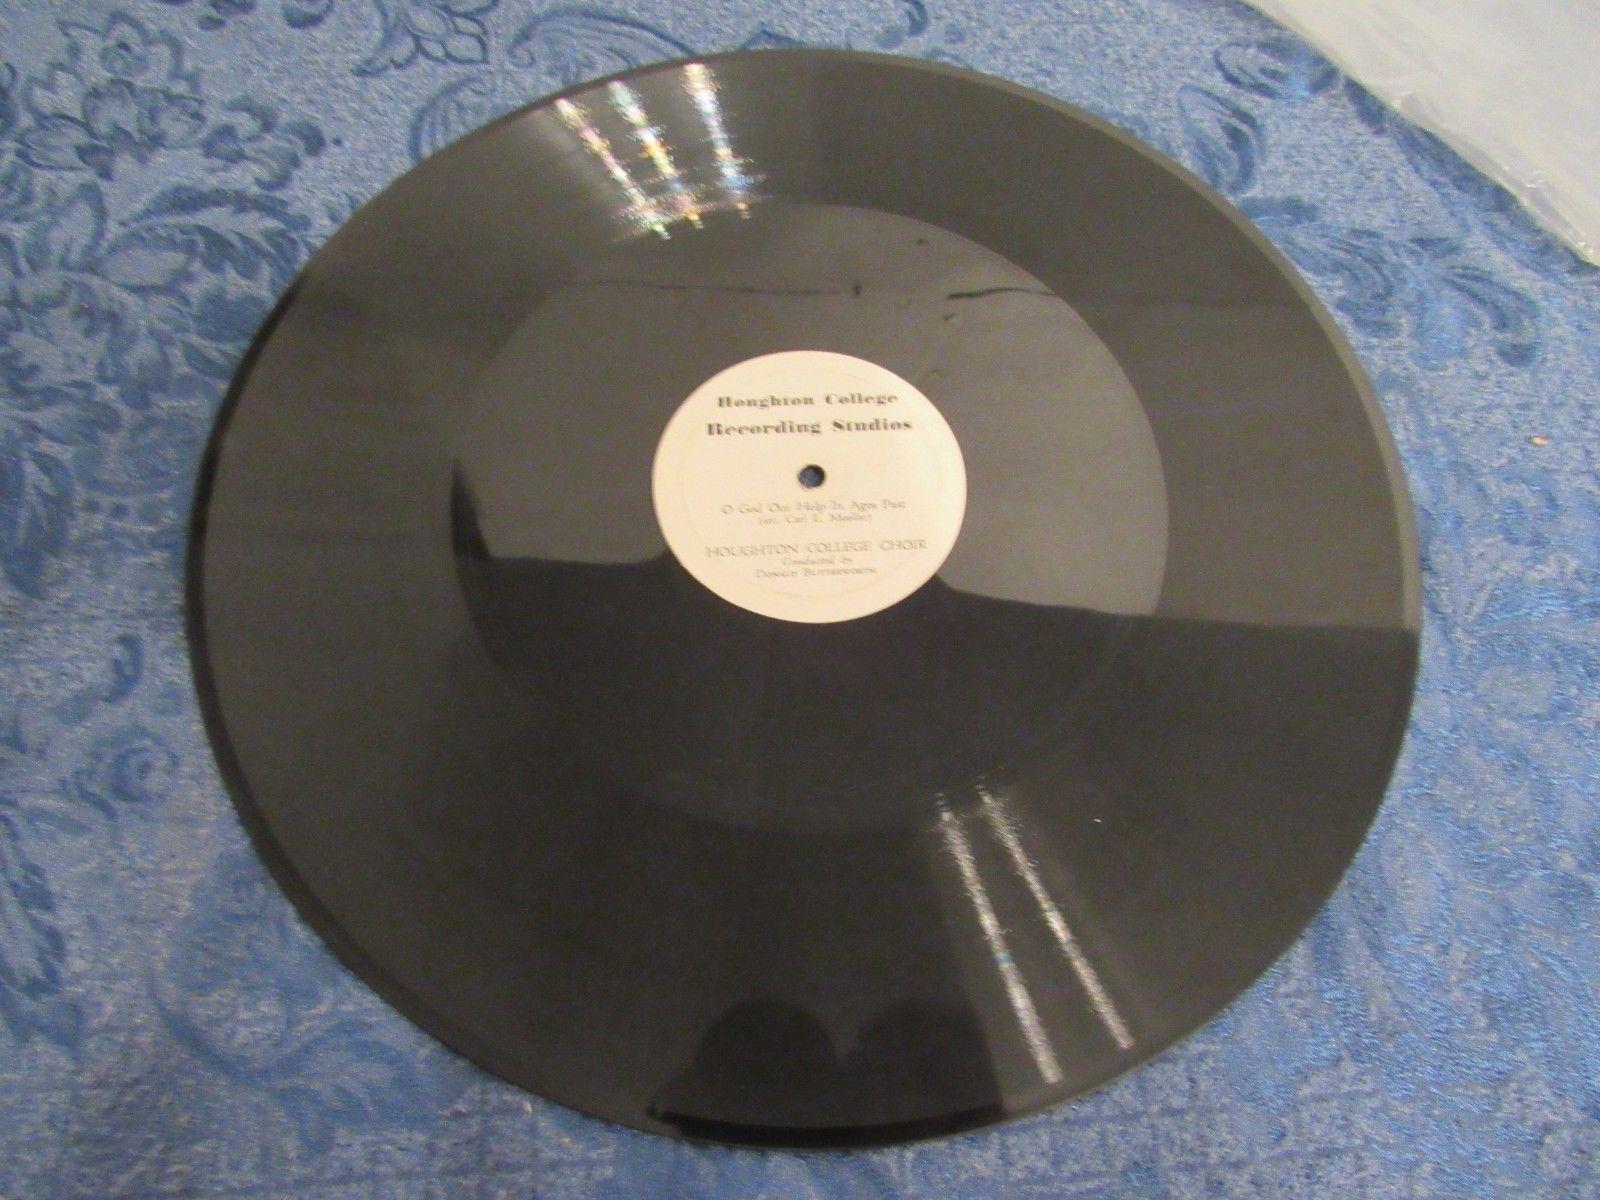 Vintage Houghton College Choir Recording Studios LP Mueller Butterworth